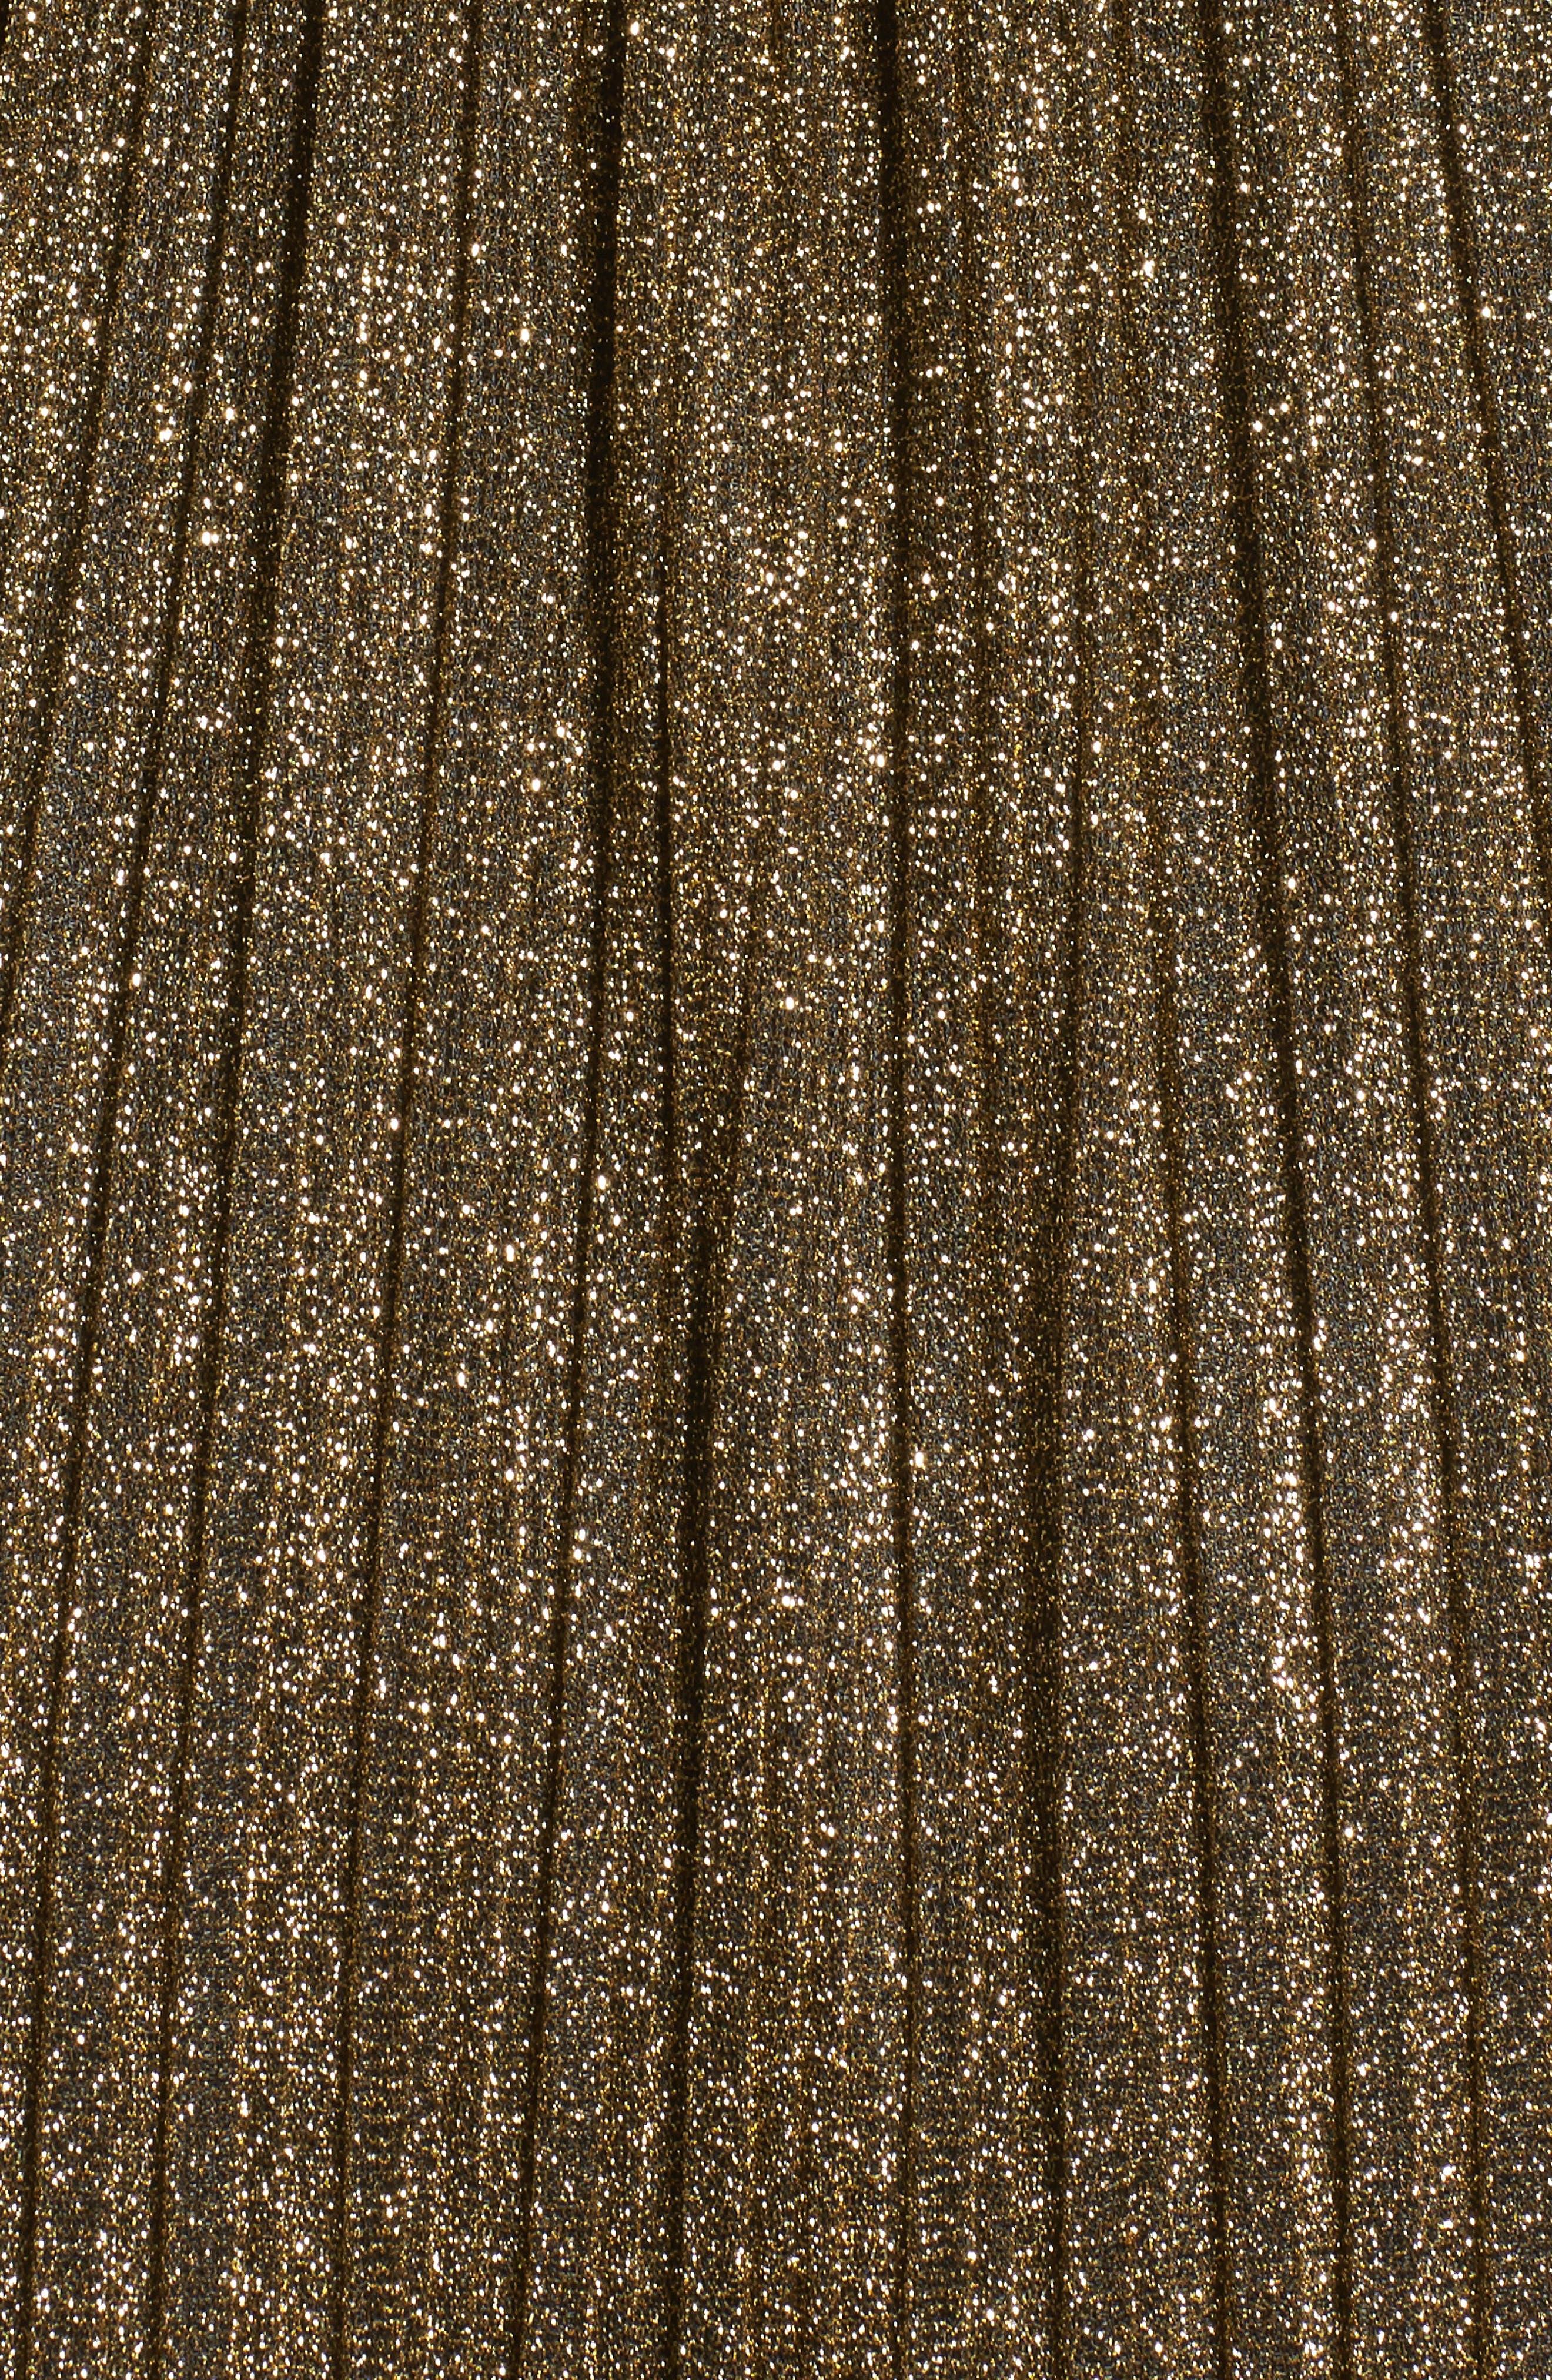 Metallic Tank Dress,                             Alternate thumbnail 5, color,                             002